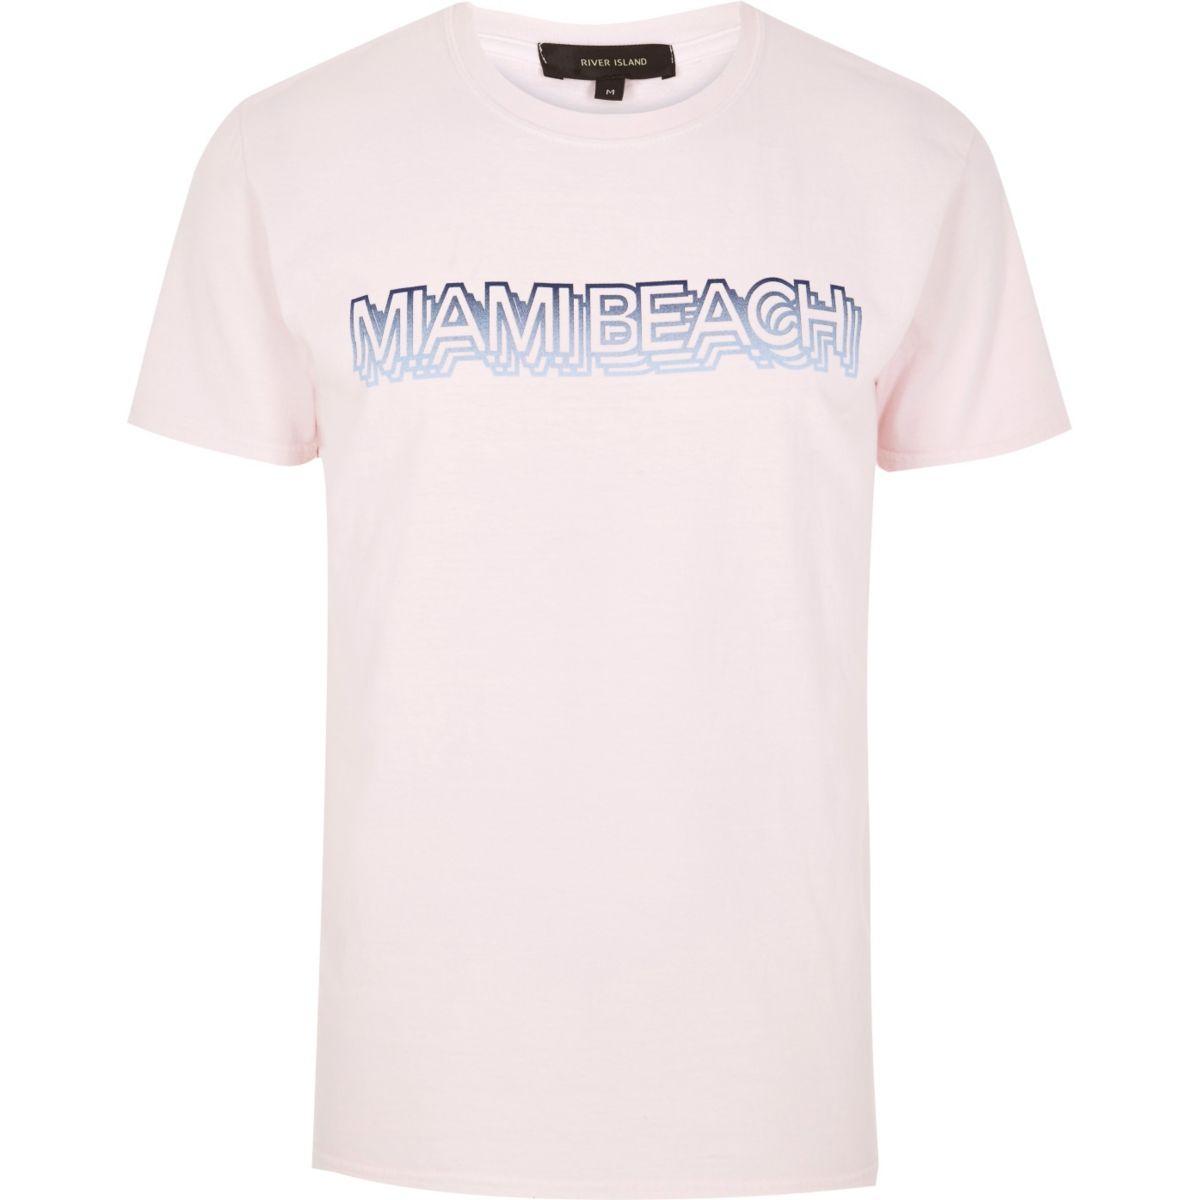 Pink Miami Beach t-shirt